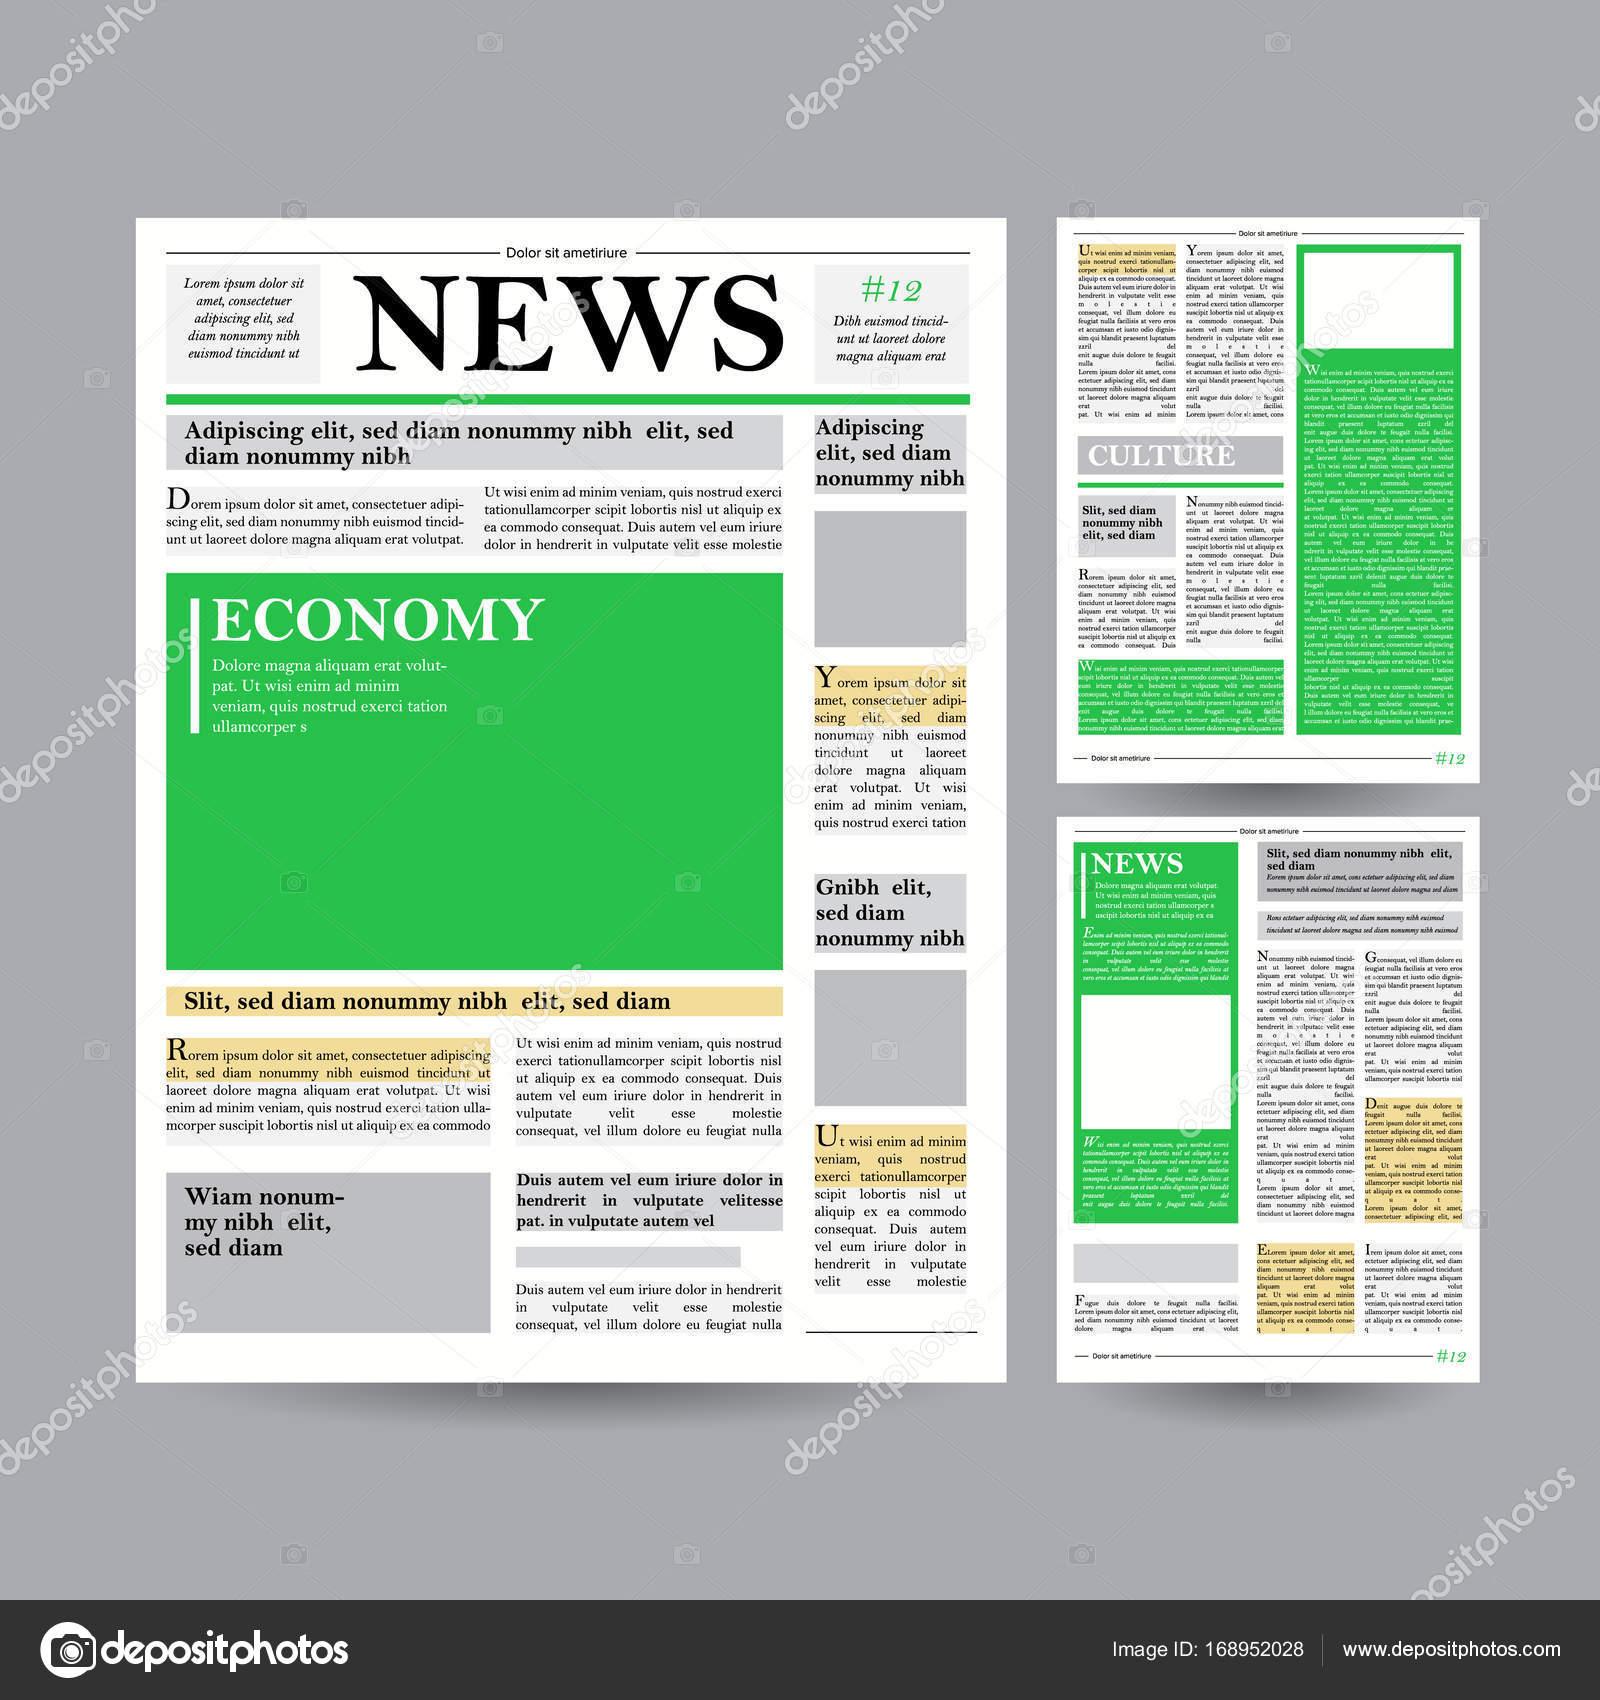 Newspaper design template vector financial articles advertising newspaper design template vector modern newspaper layout template financial articles business information world news economy headlines saigontimesfo